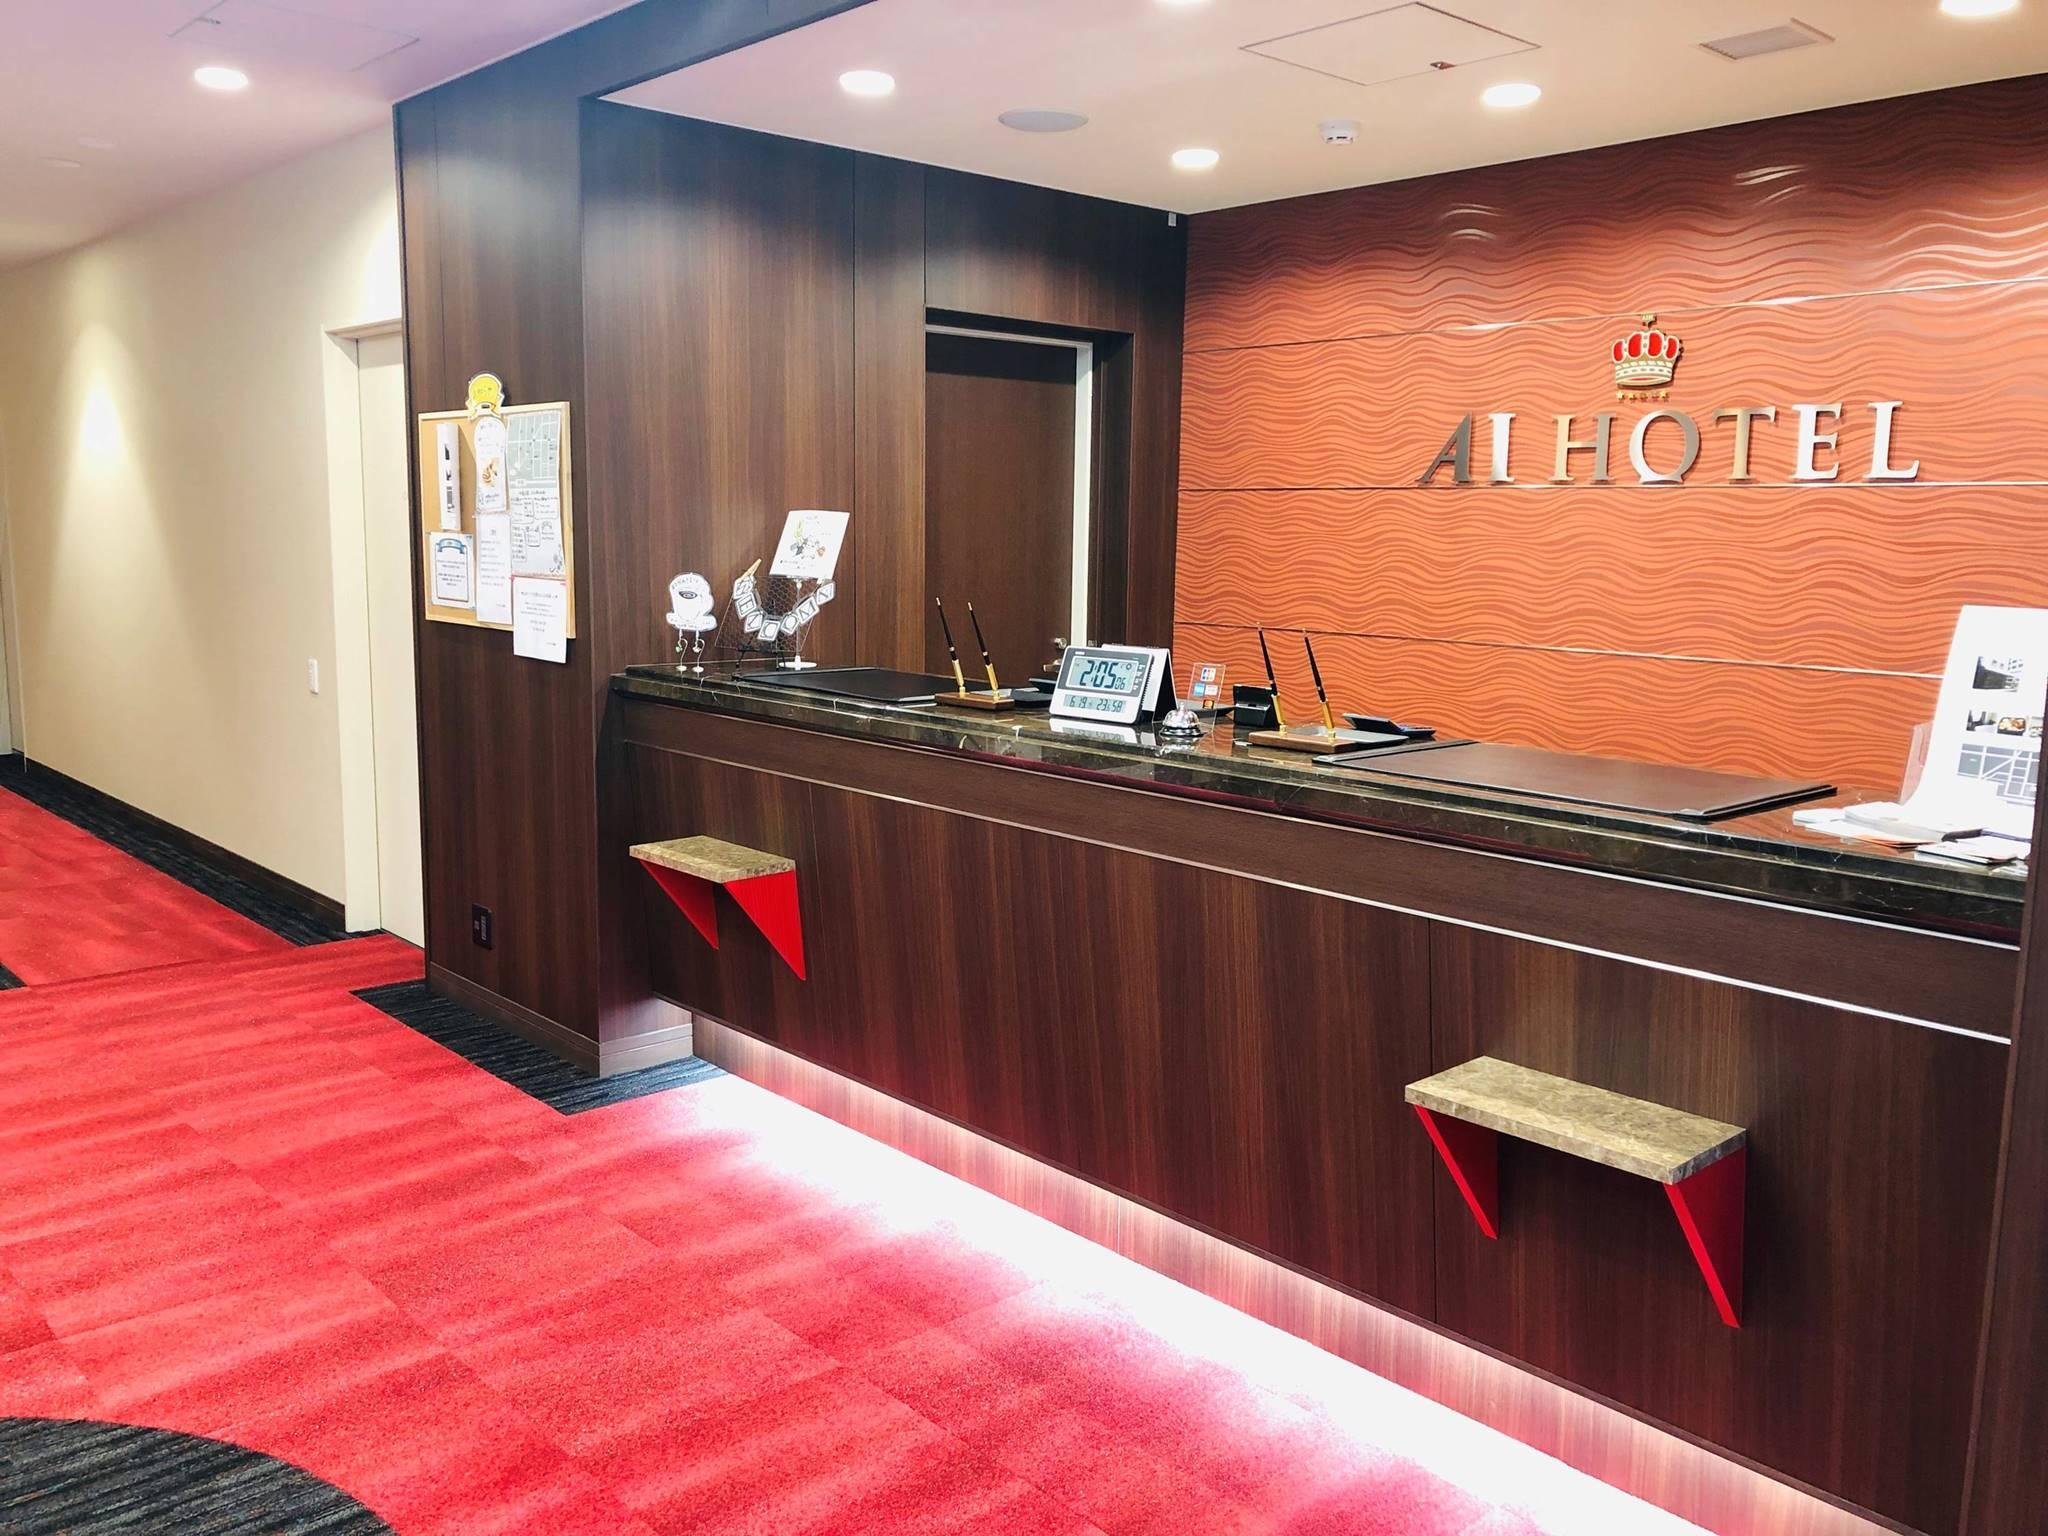 AI Hotel Hashimoto, Sagamihara